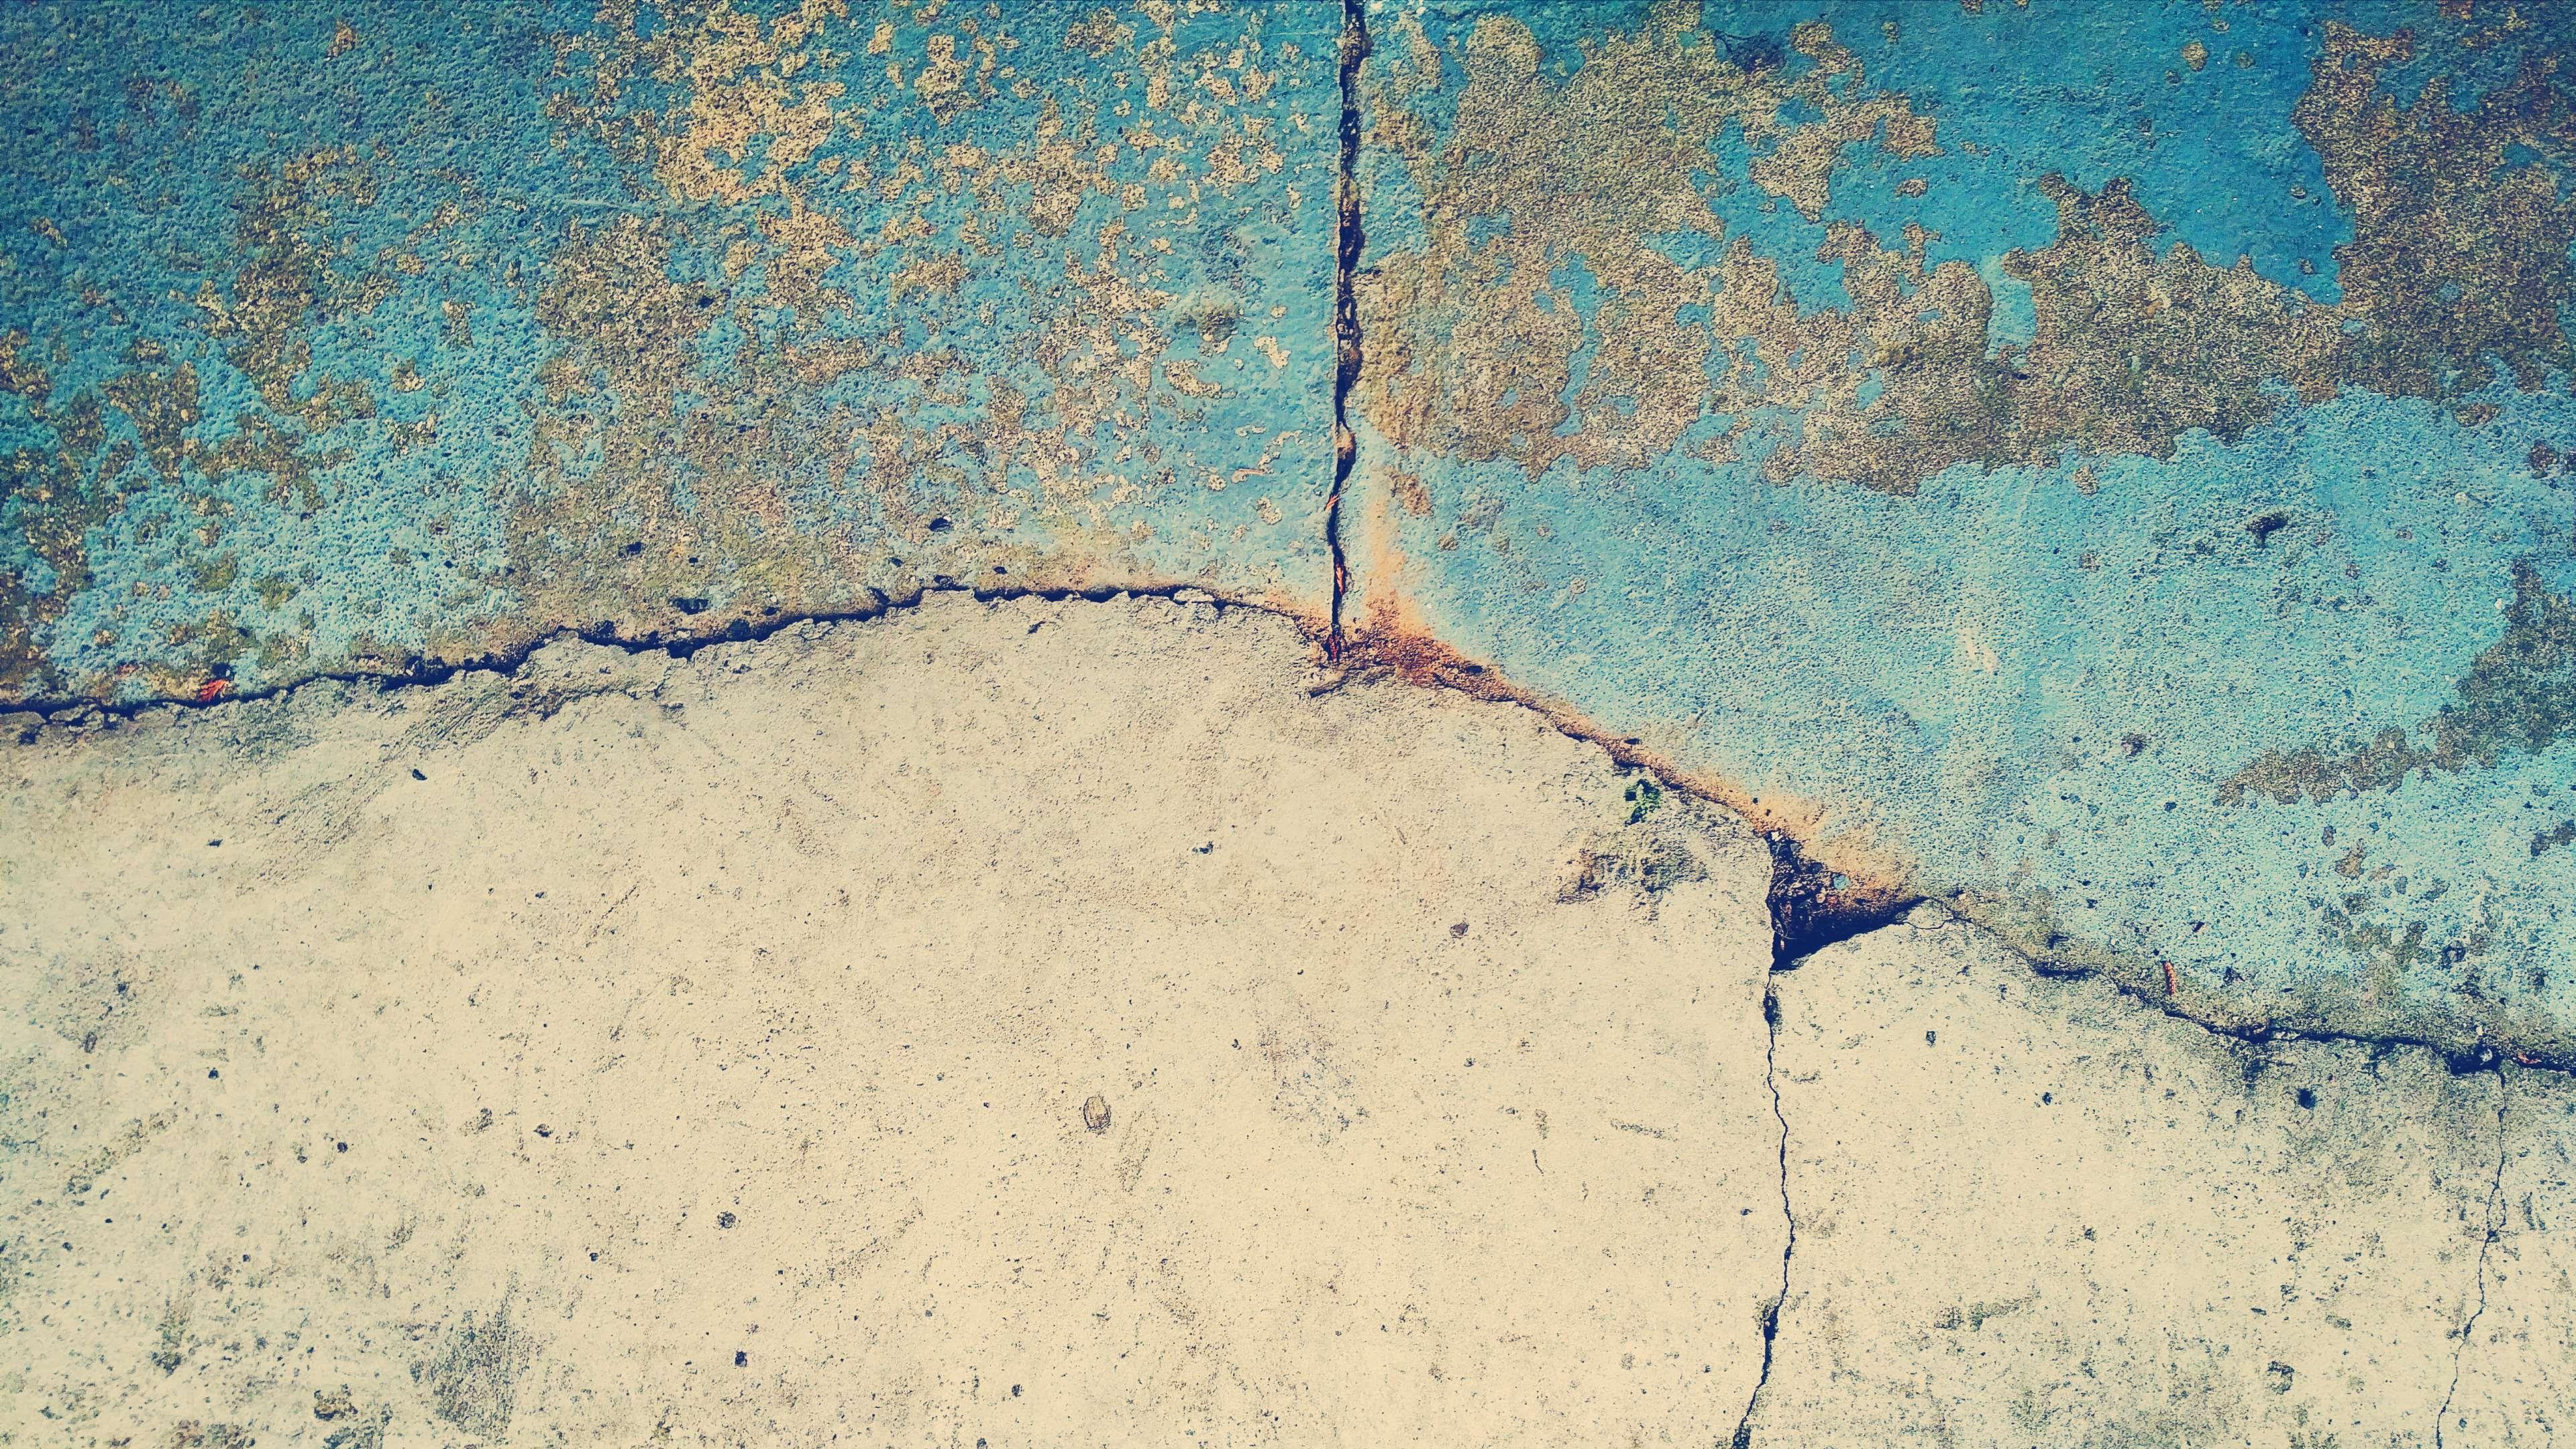 Abstract Art Backdrop Background Blue Concrete Cracked Cracks Distressed Floor Gold Grey Material Metal Rou Abstracto Telones De Fondo Pavimento